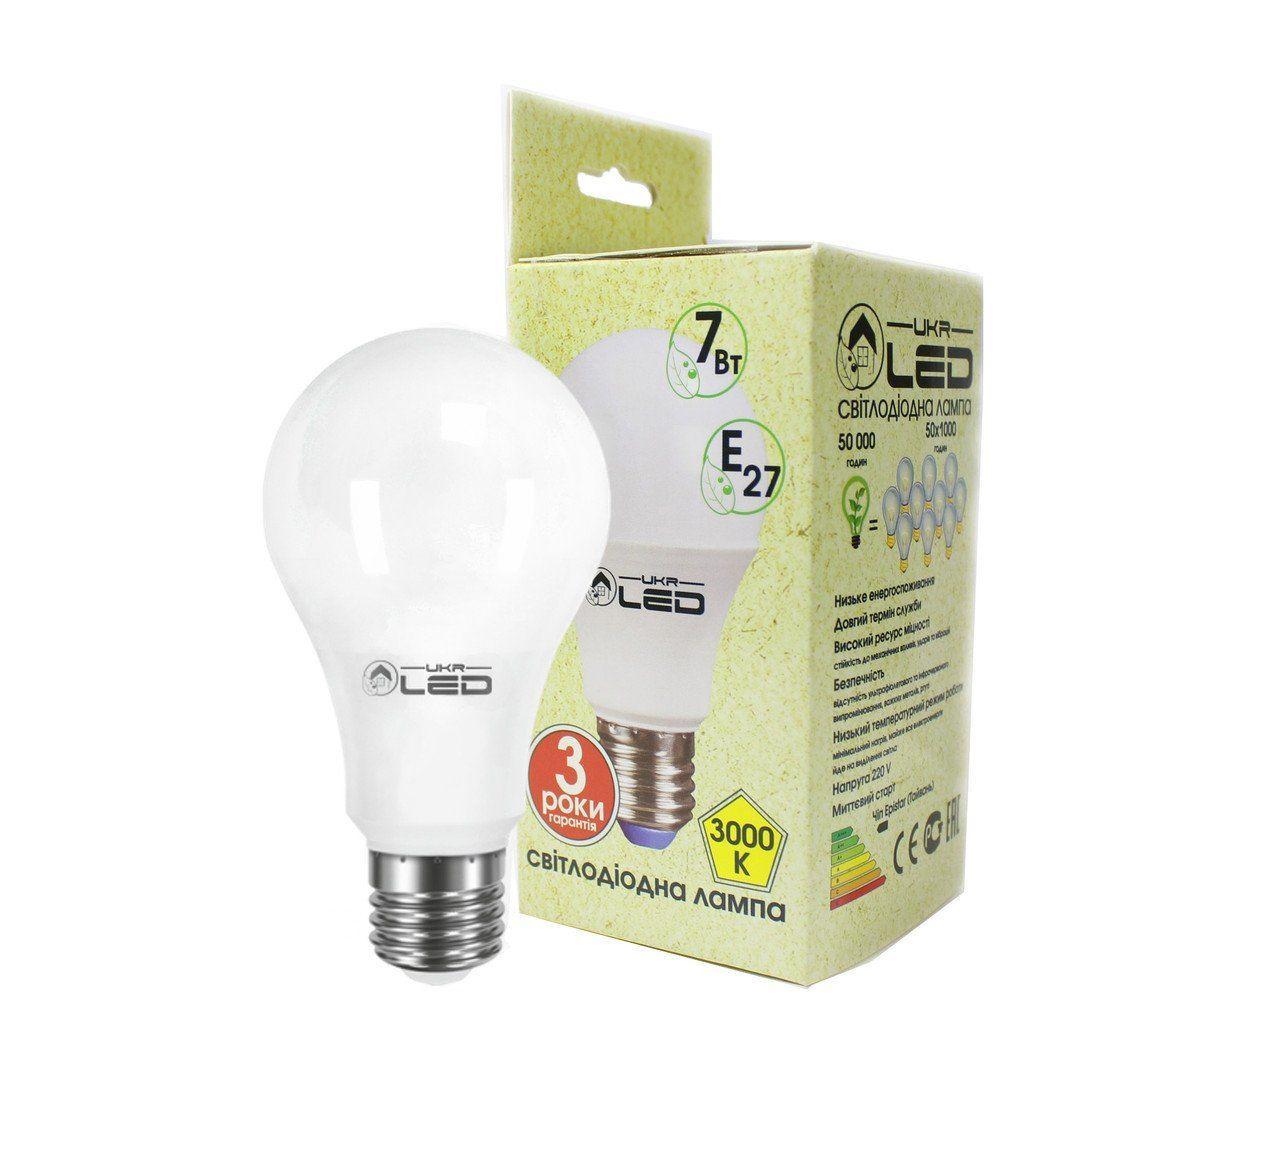 Светодиодная лампа UkrLed Е27 7W (Груша) 3000К (175)